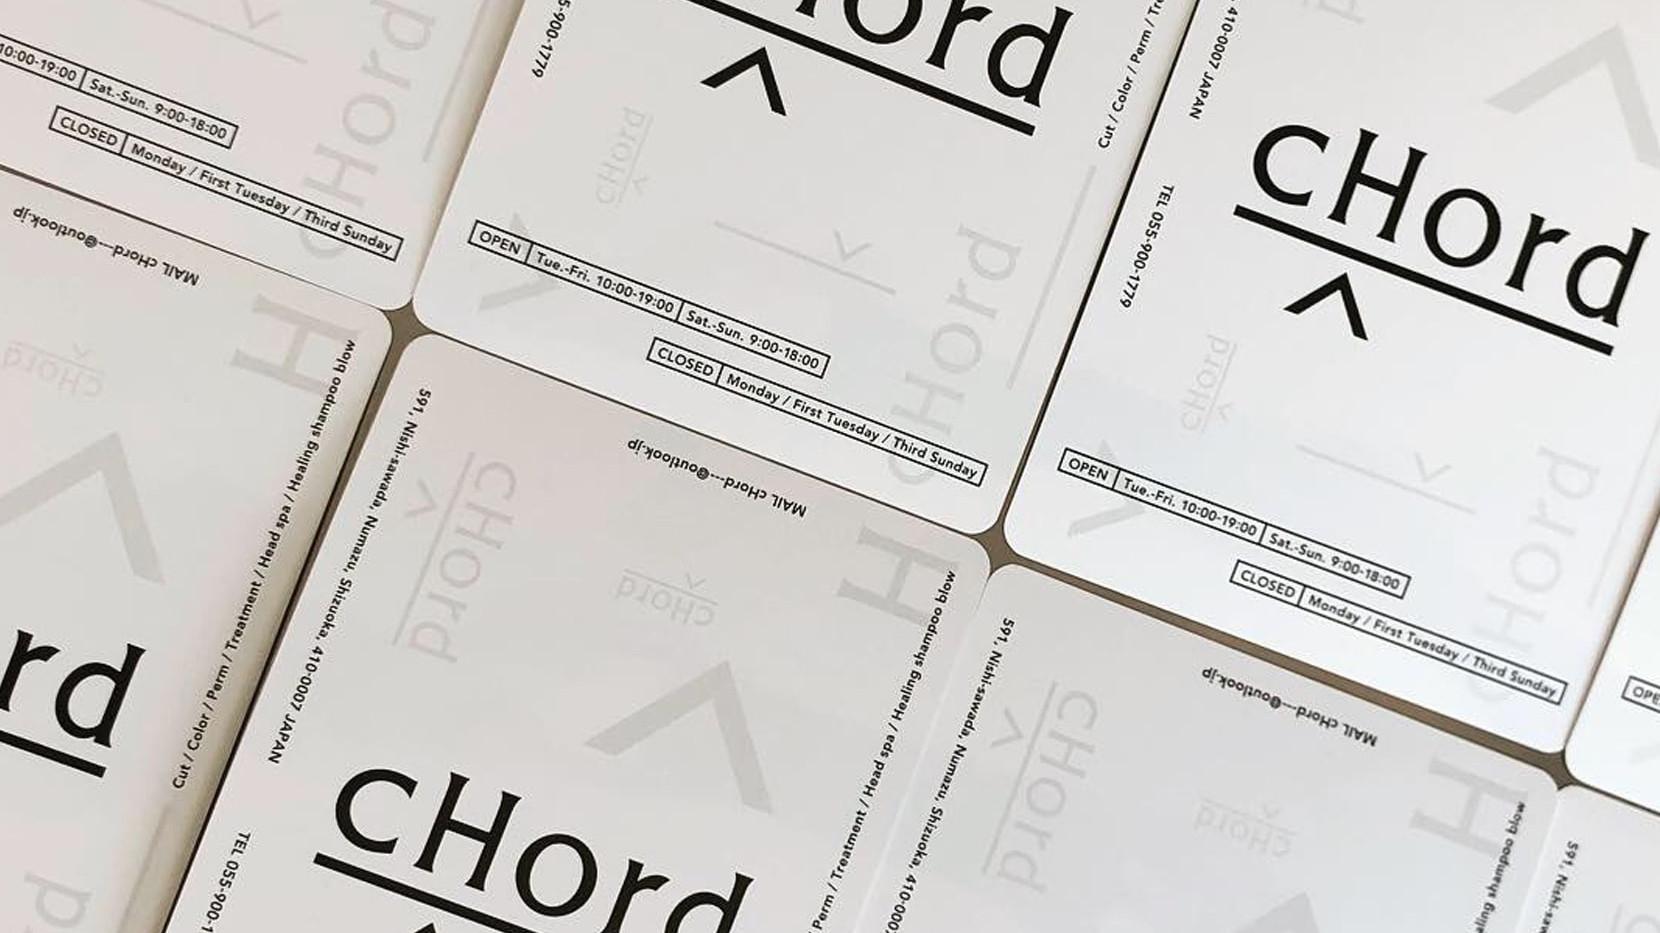 cHord1-min.jpg